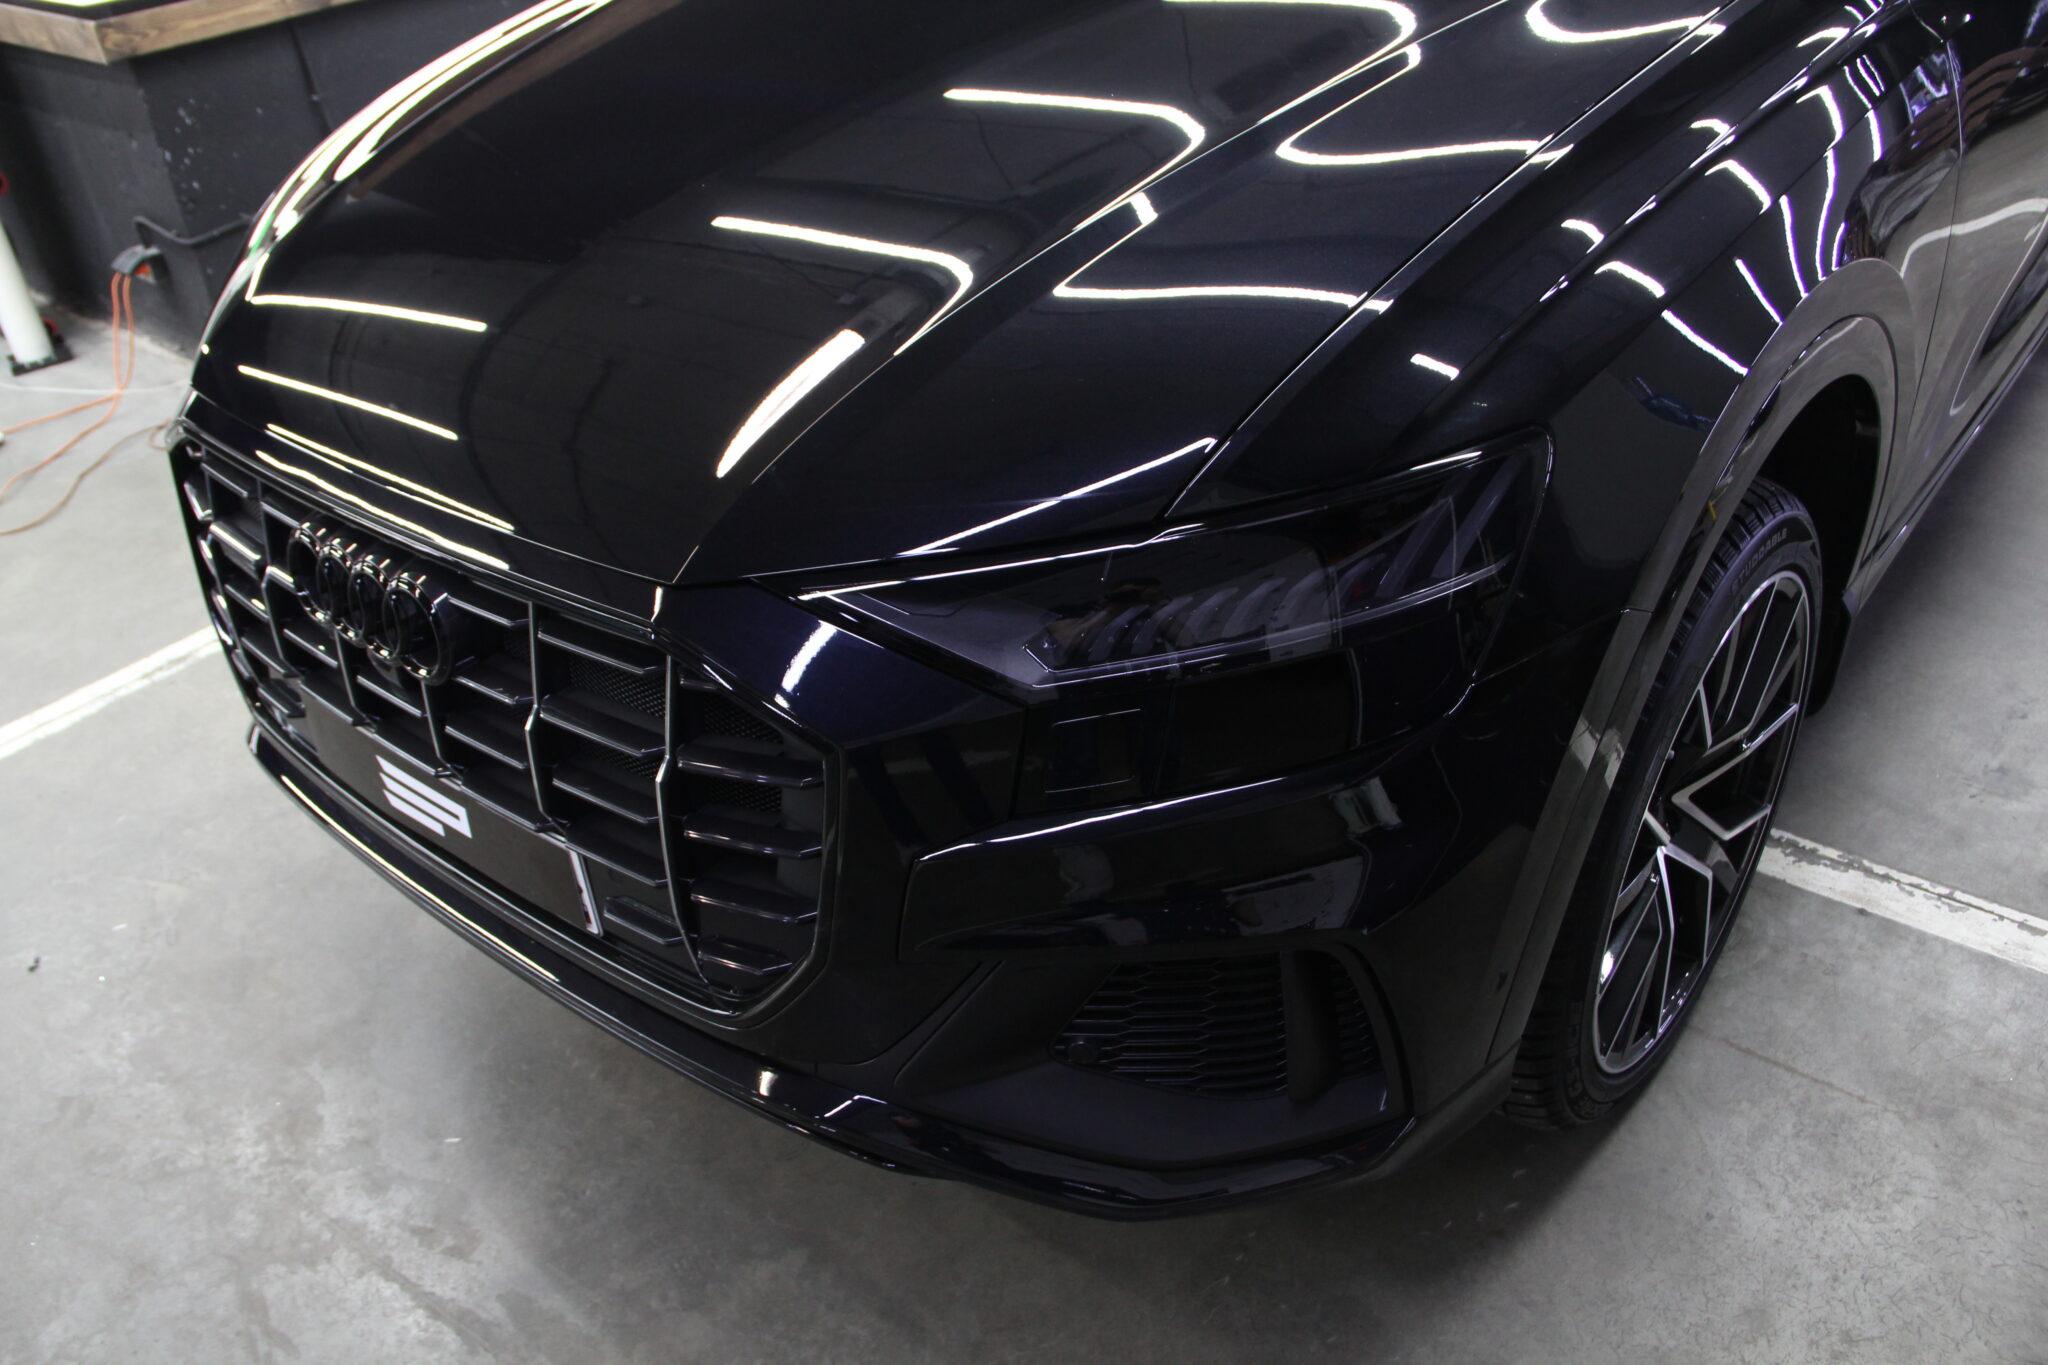 Оклейка кузова автомобиля Audi Q8